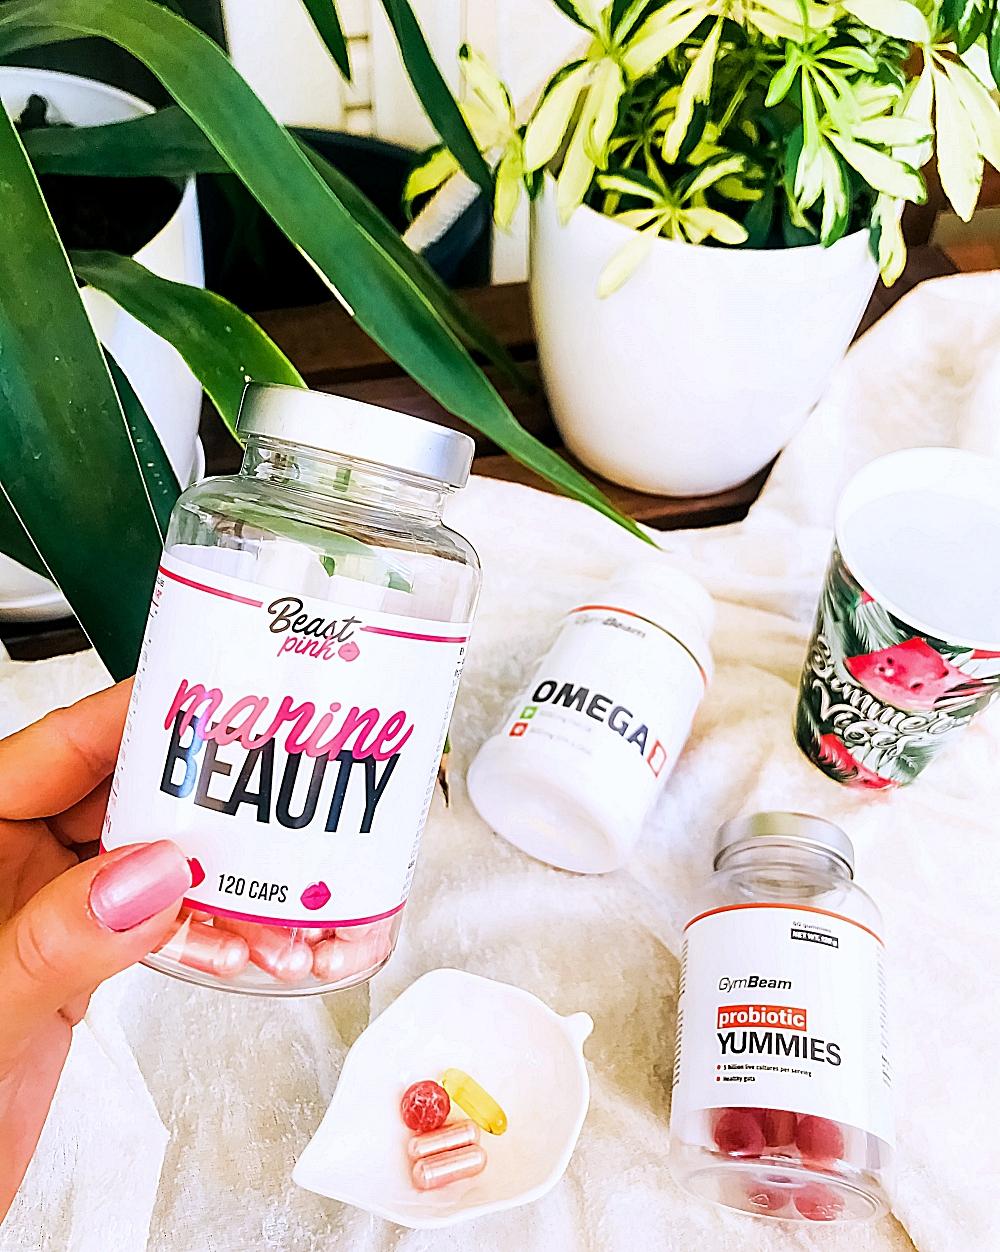 Gymbeam supplements omega 3 probiotic yummies, Beast Pink marine beauty 120 capsules